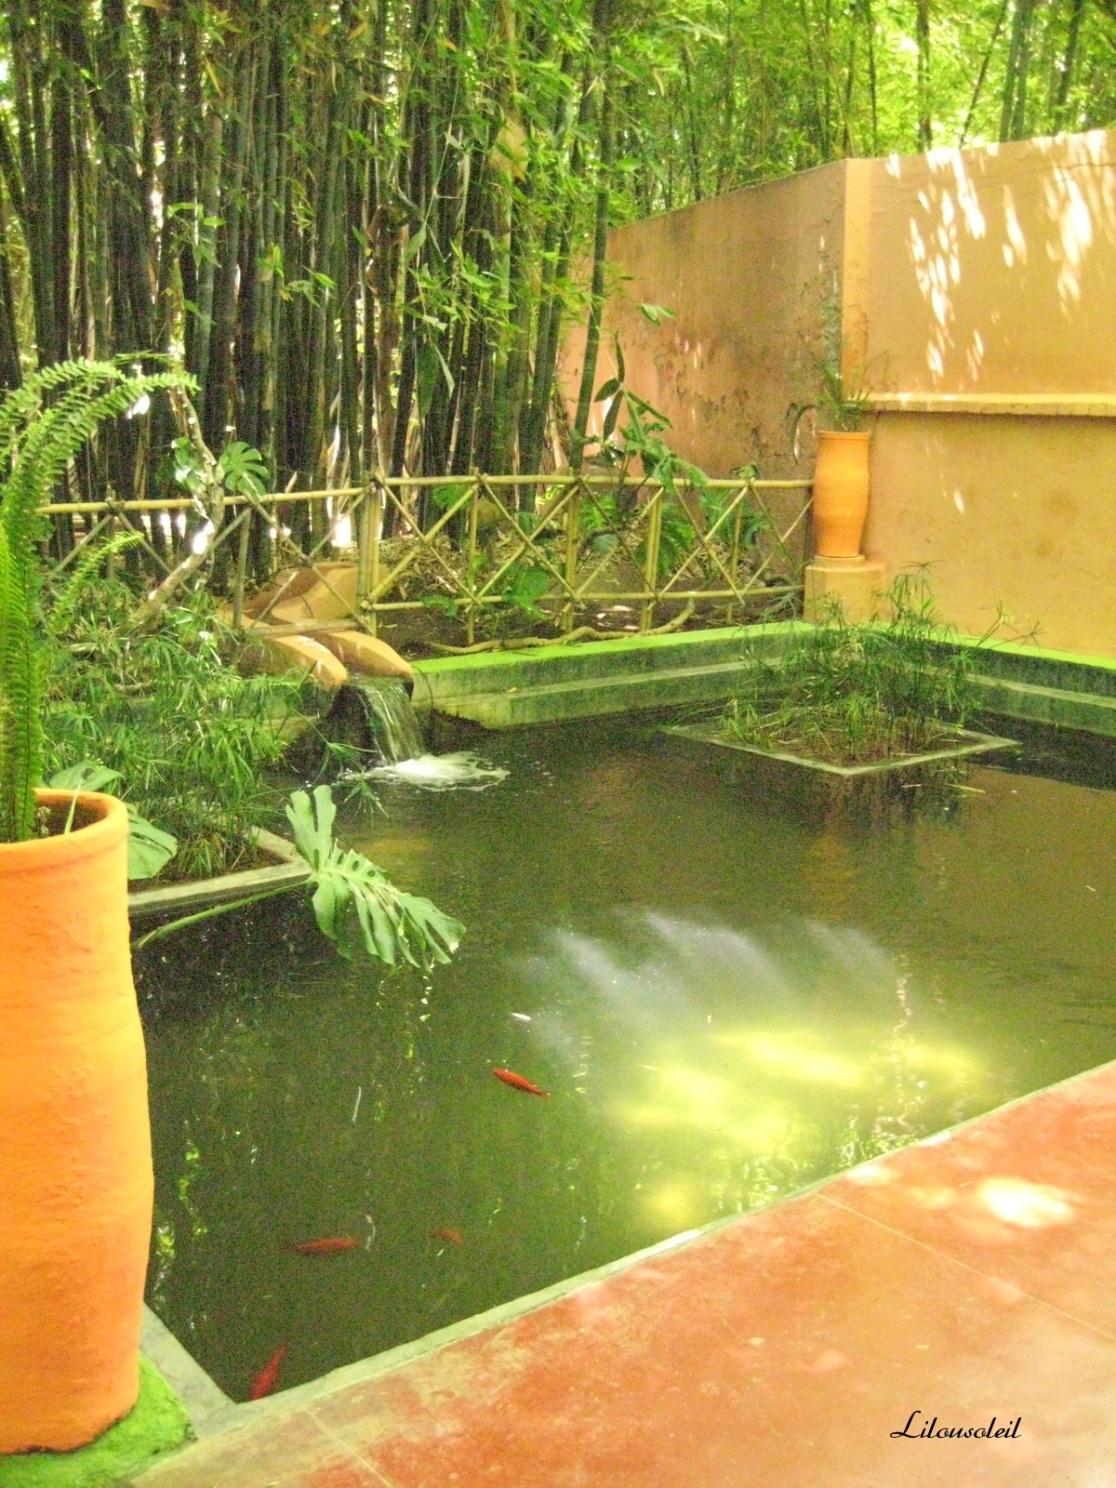 semaine 4 parc Majorelle Maroc.jpg